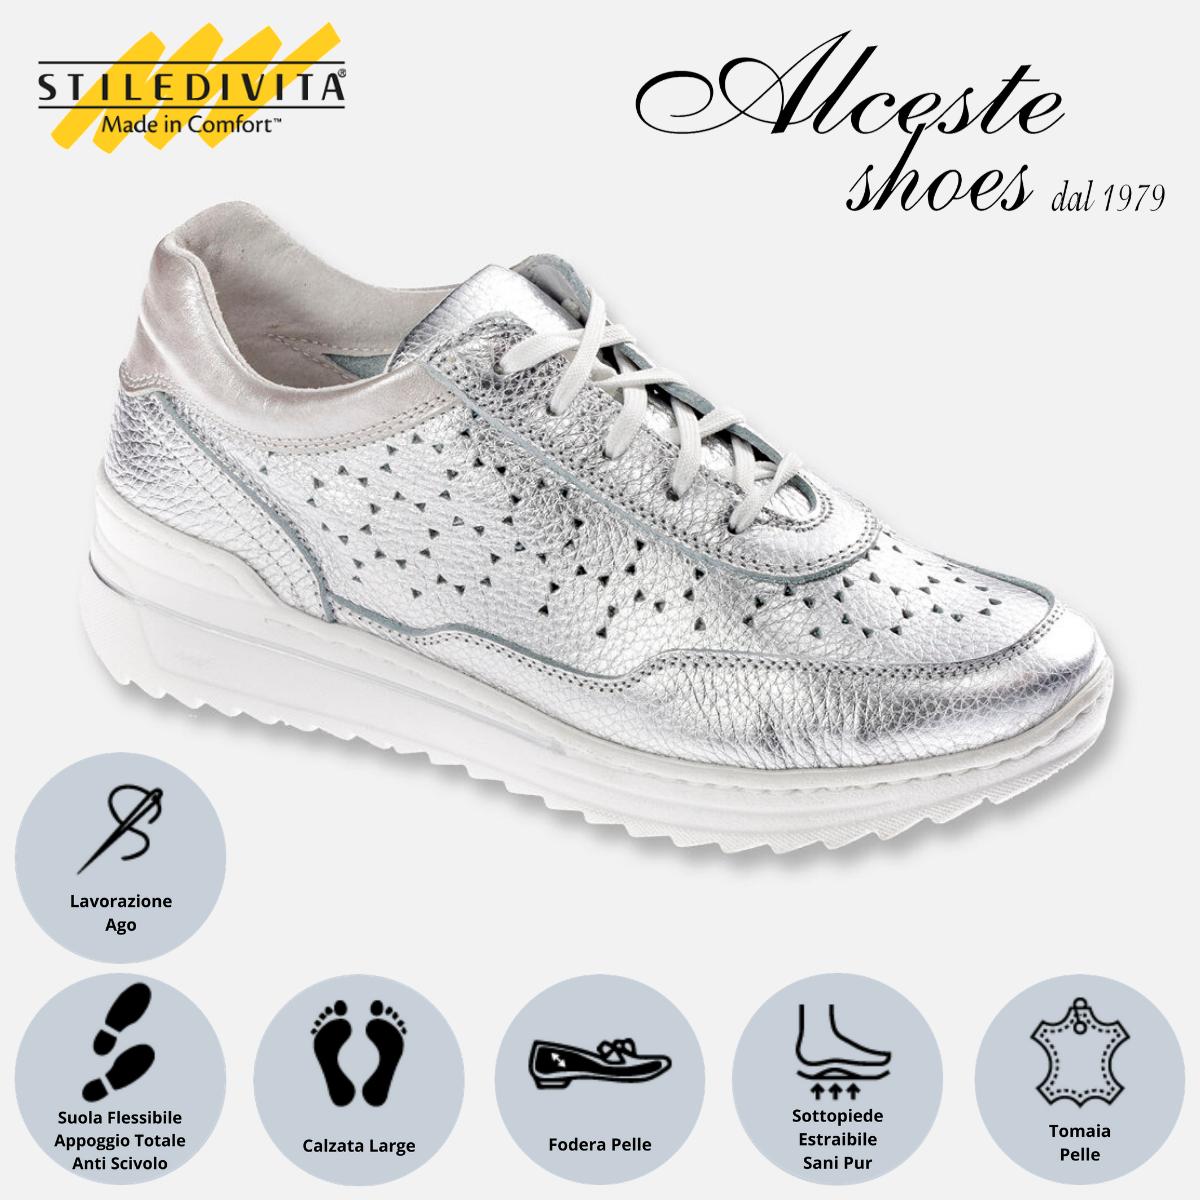 Sneakers Traforate Stiledivita Art. 7442 Pelle Argento Alceste Shoes 7442 Argento